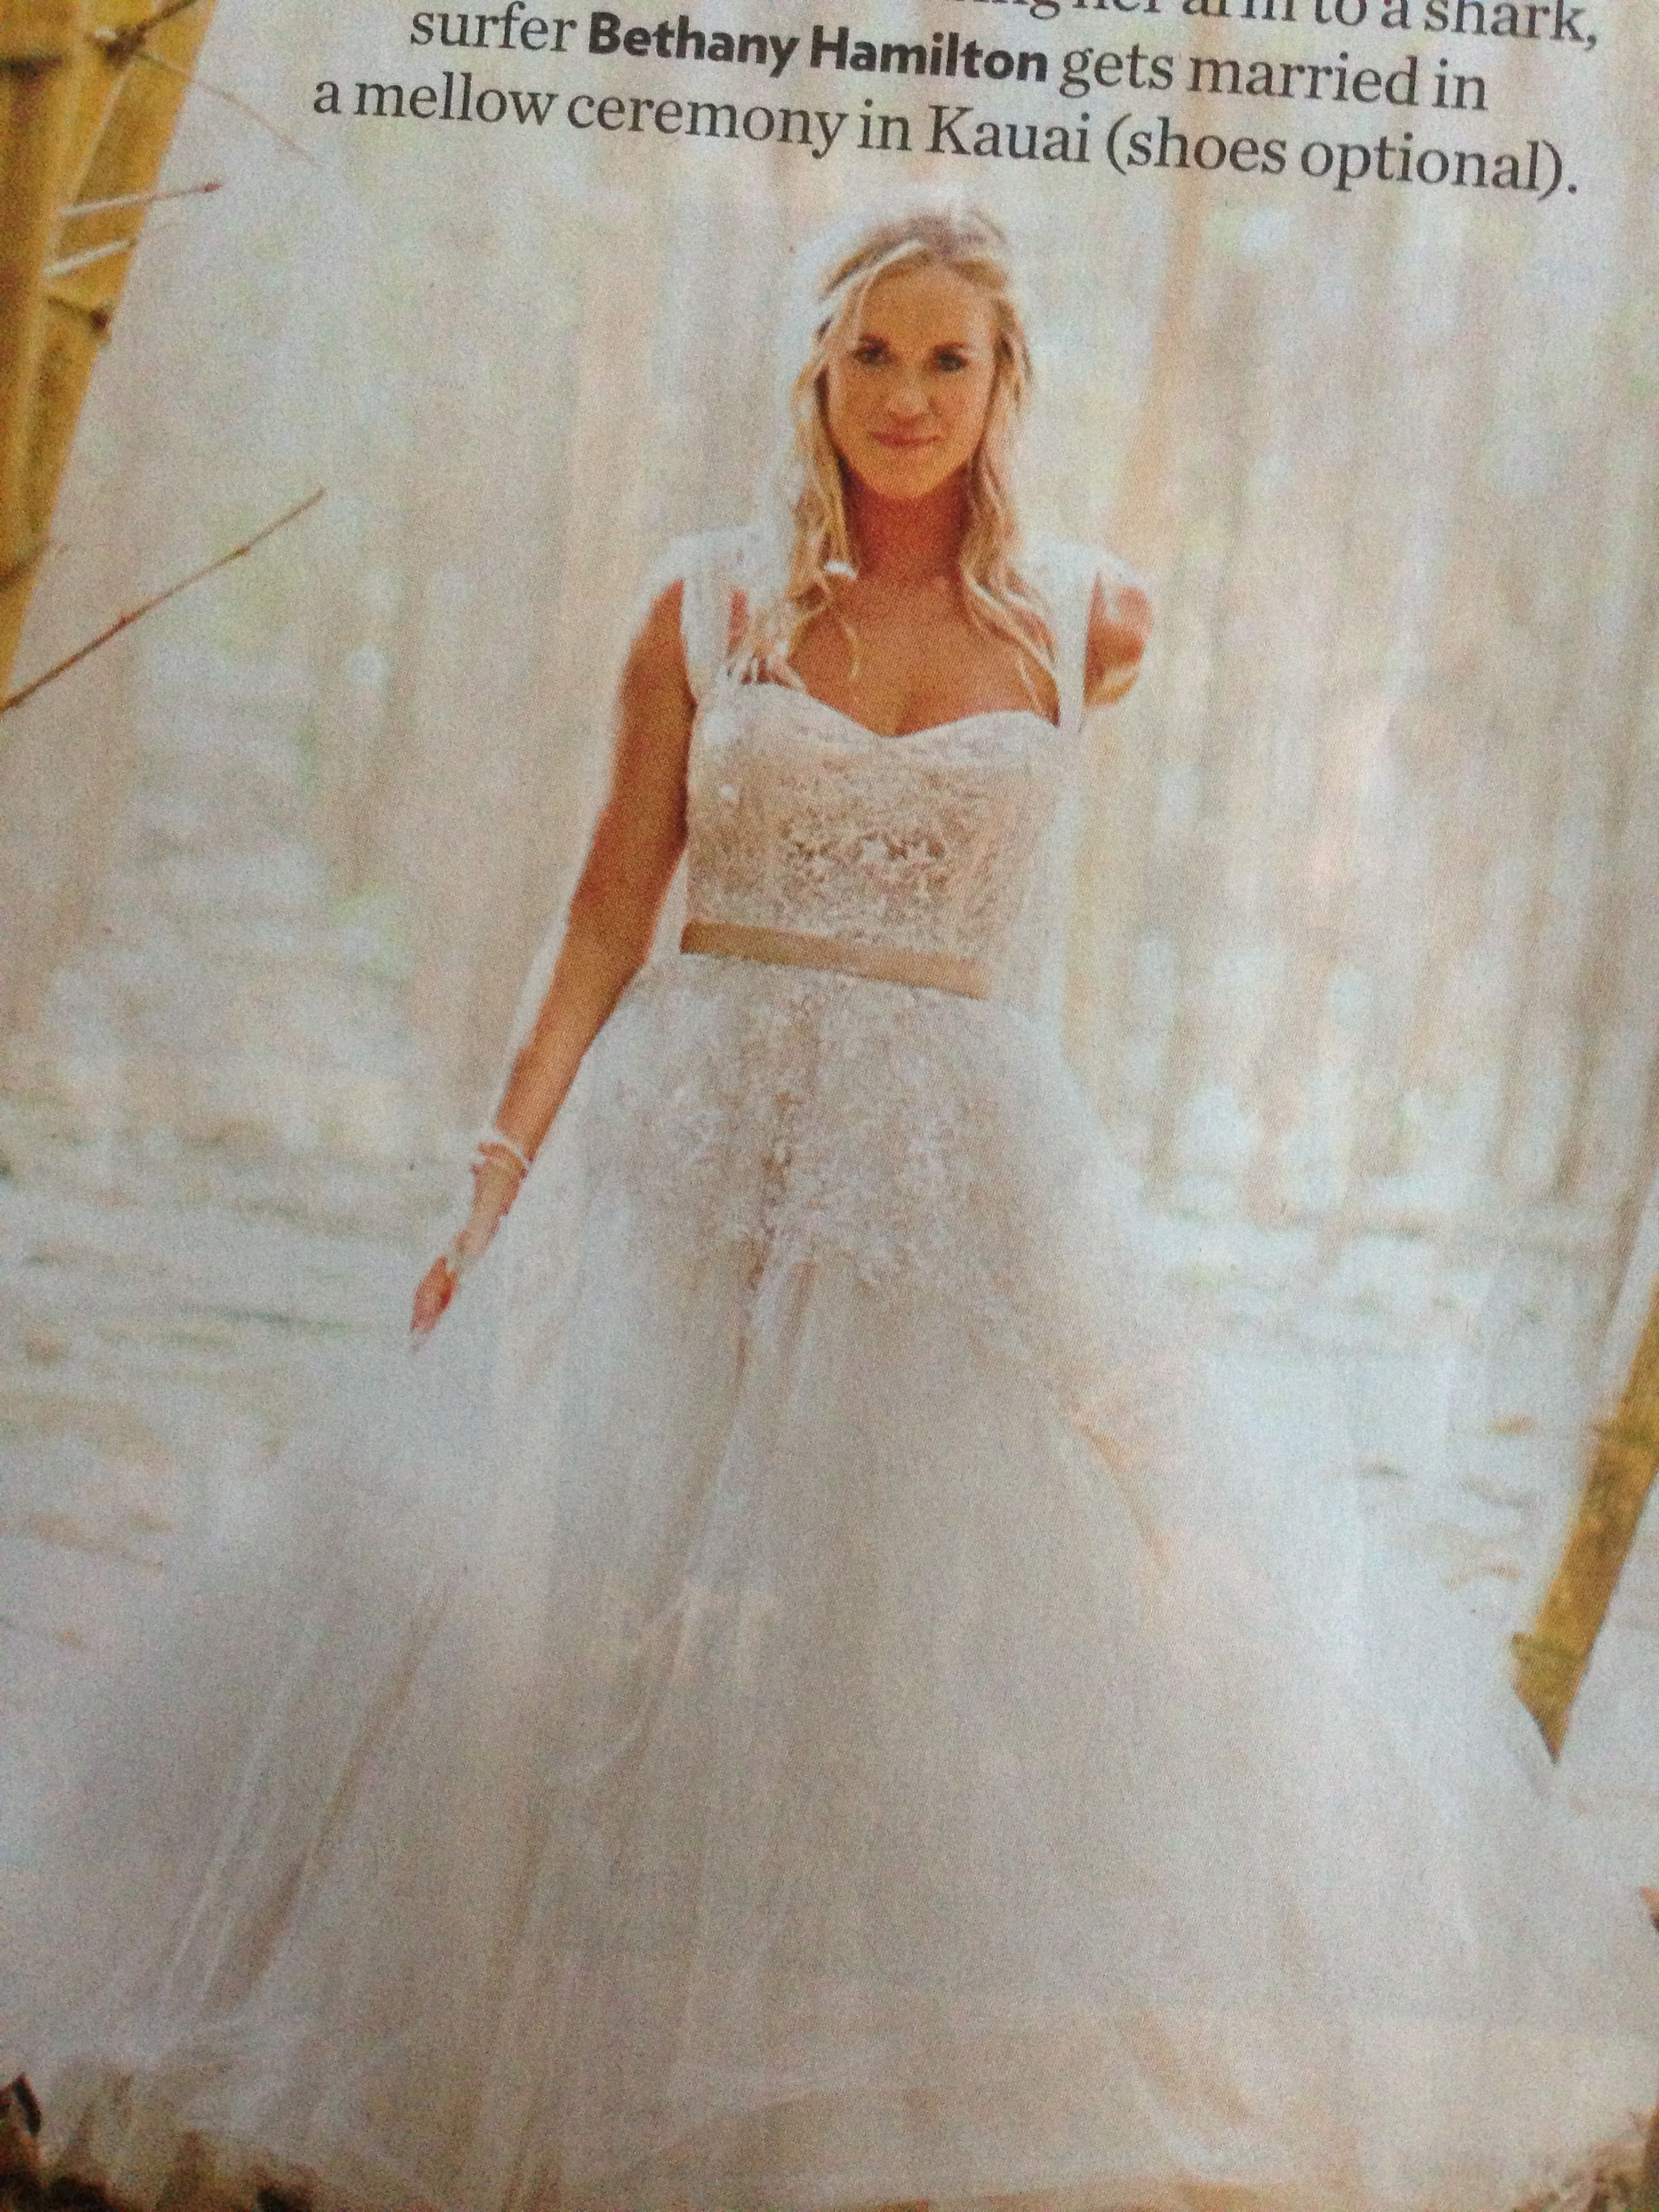 Pin By Bella On Wedding Limos And Ideas Wedding Dresses Wedding Dress Inspiration Bethany Hamilton